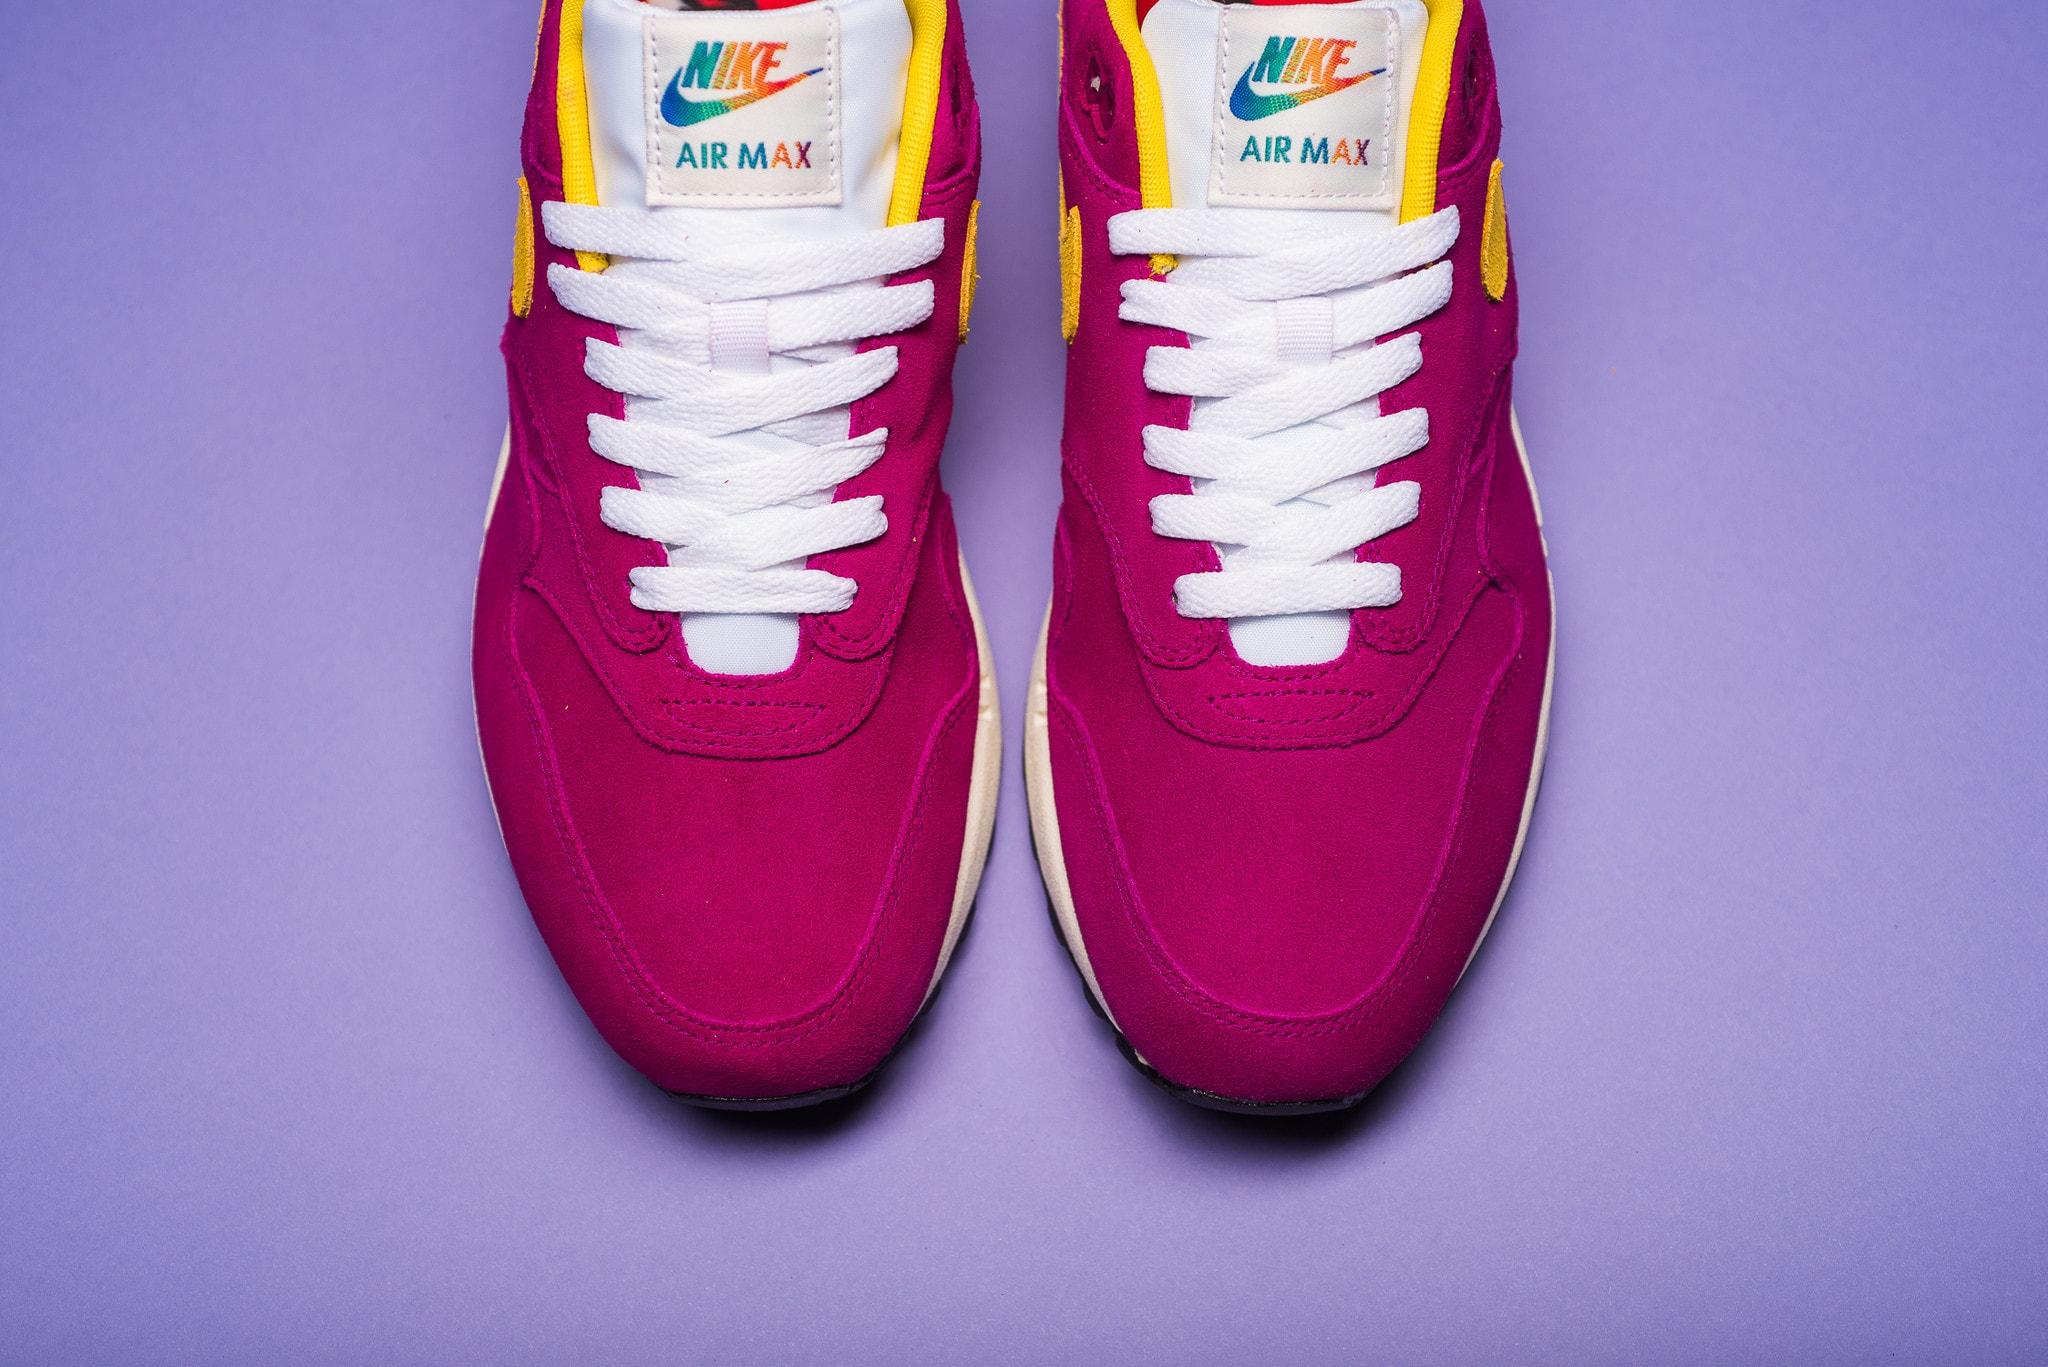 Nike Air Max 1 Dynamic Berry Vivid Sulfur Toe